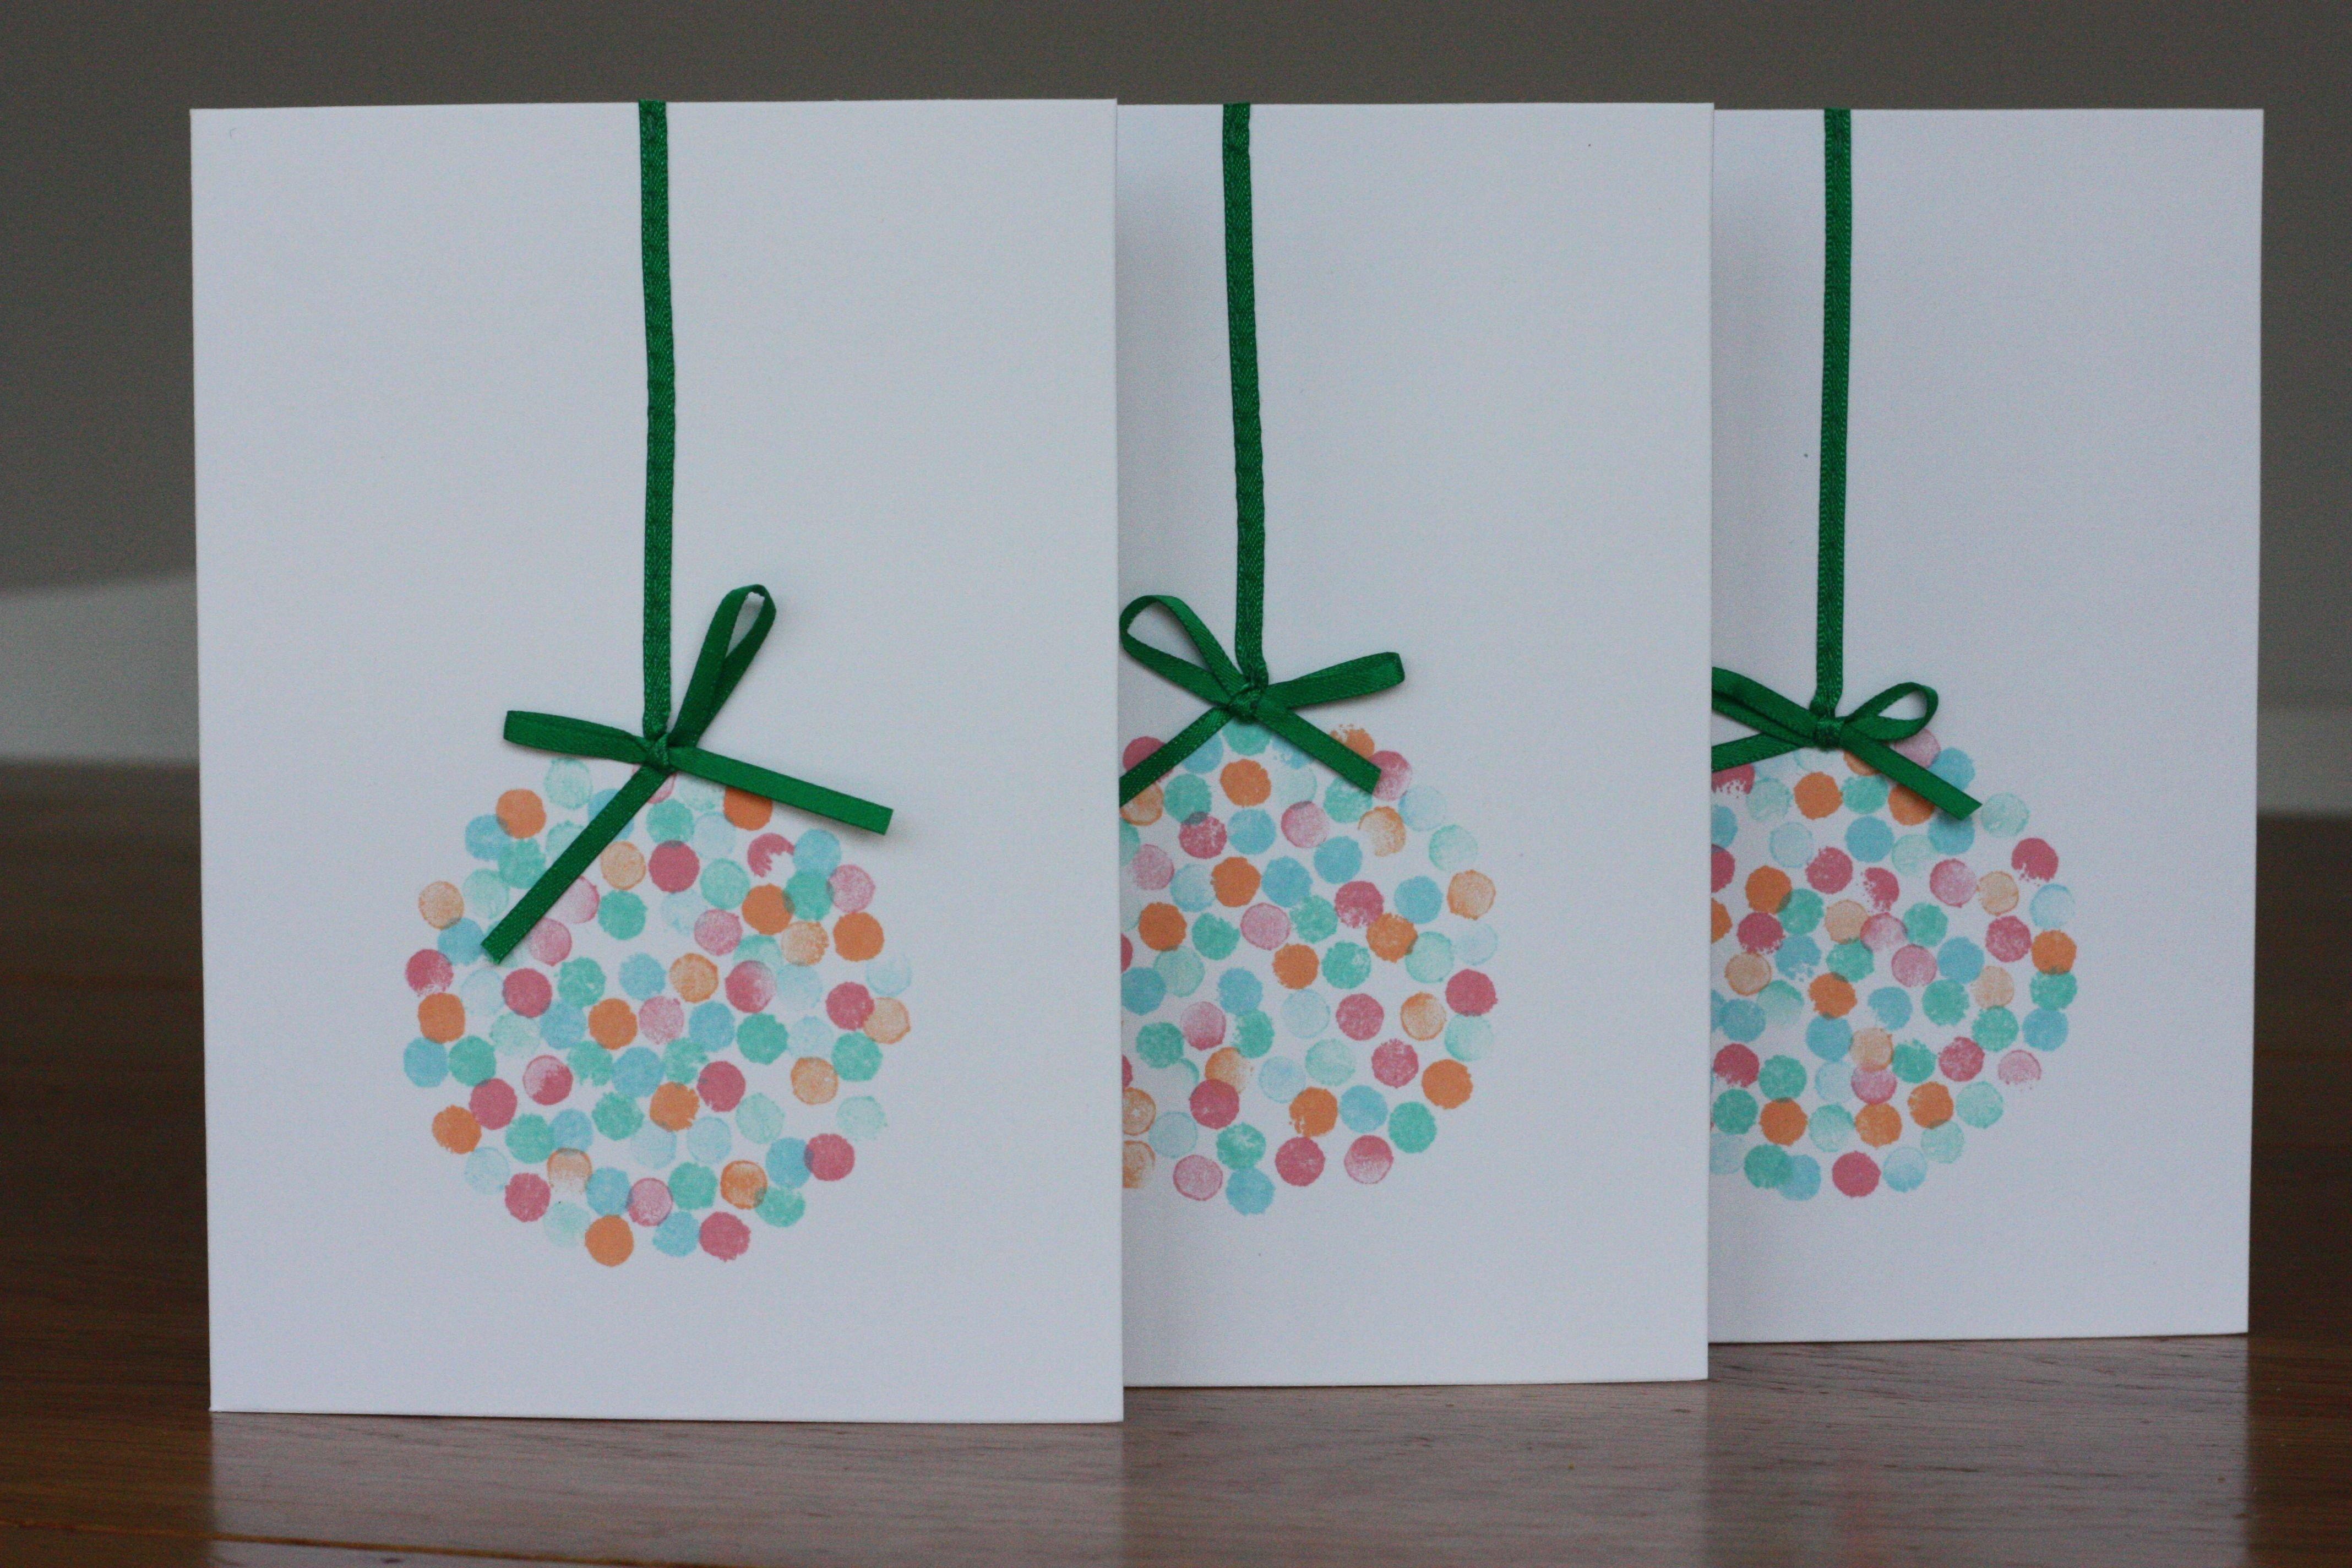 creative handmade card ideas for christmas | homemade christmas